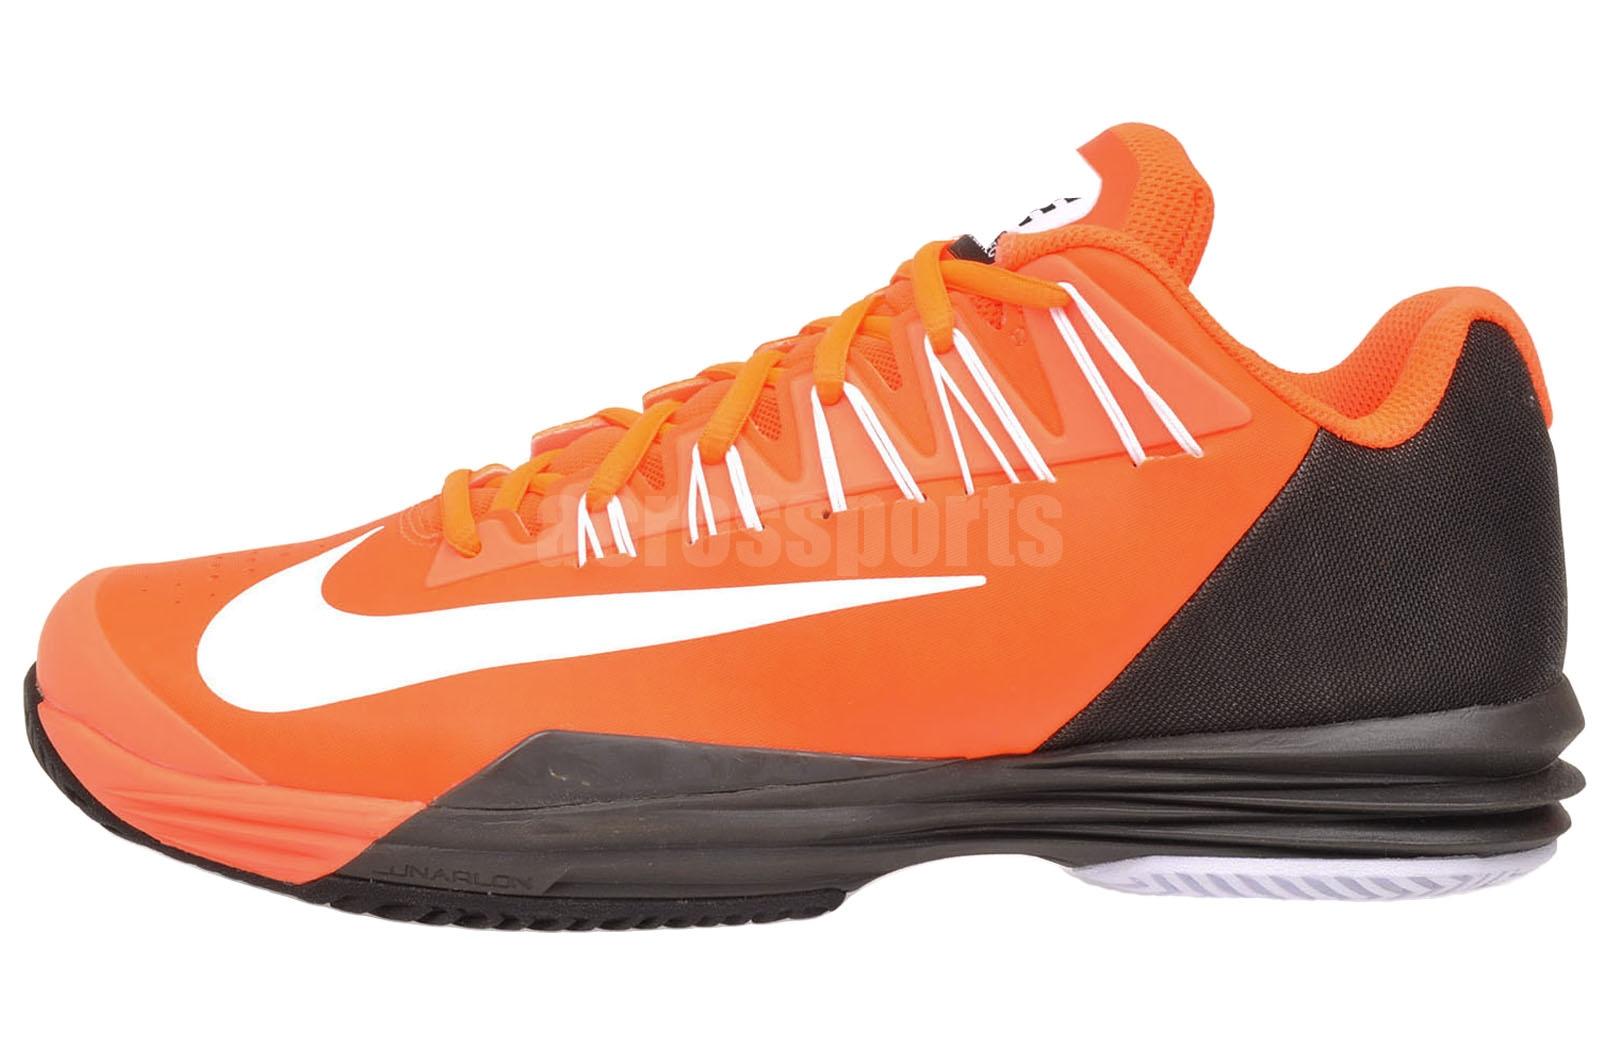 nike lunar ballistec mens 2014 tennis shoes rafael nadal